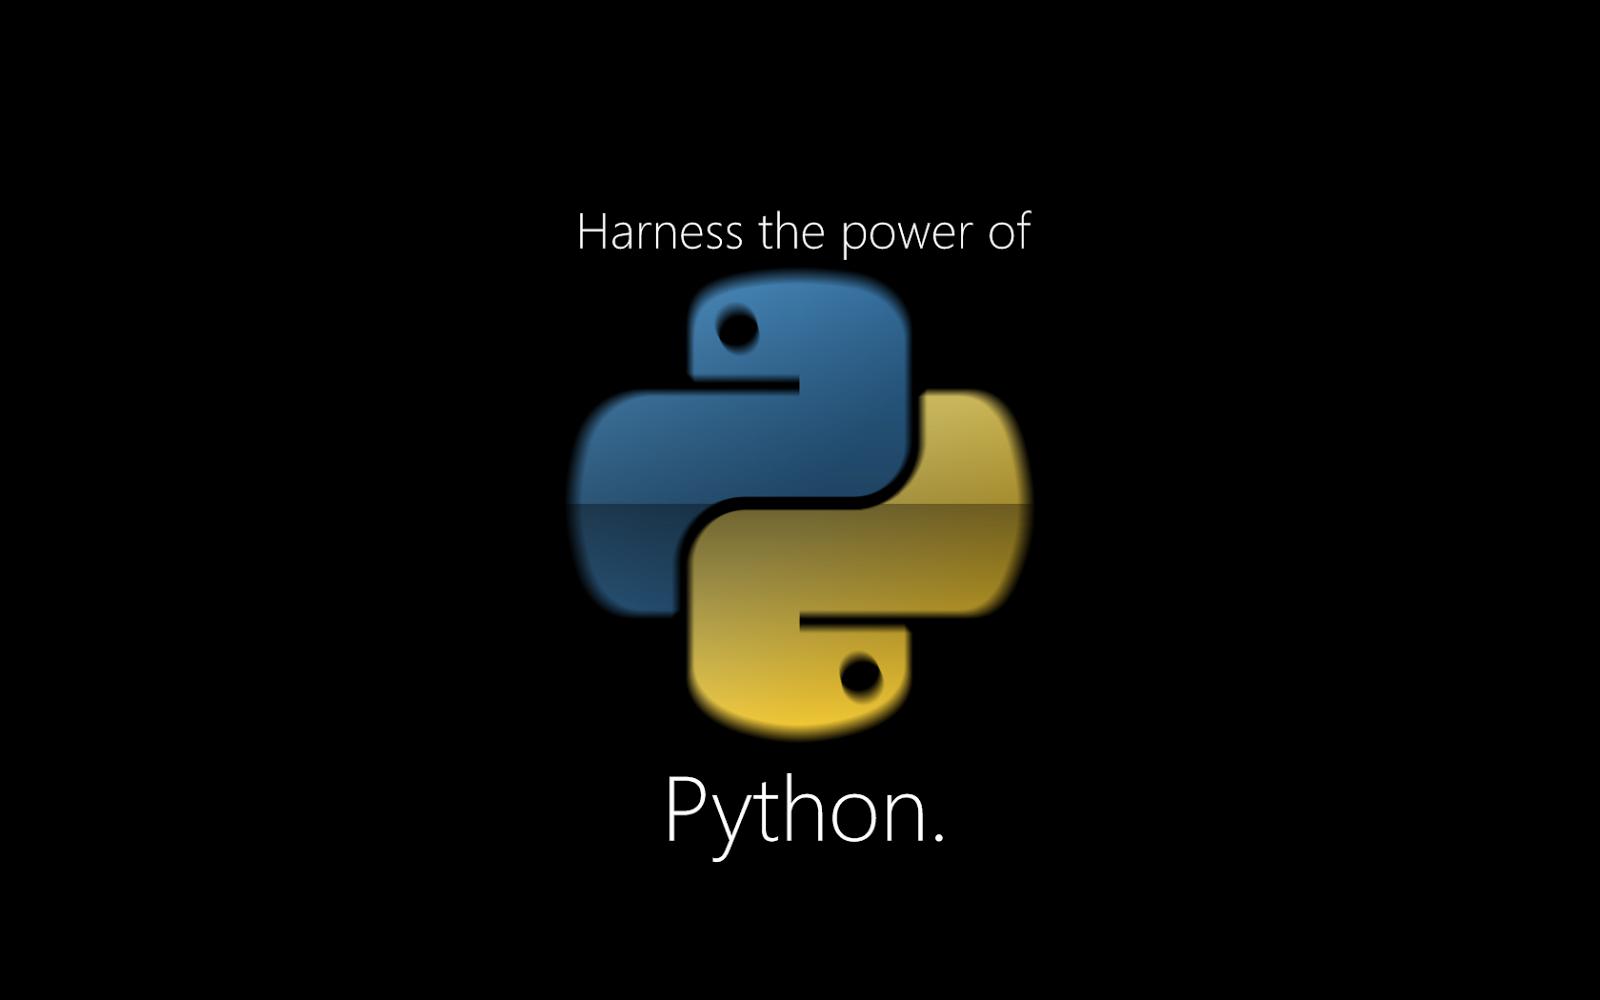 Download Ebook, Download Ebook Gratis, Belajar, Python, Pemrograman, Pemrograman Web,